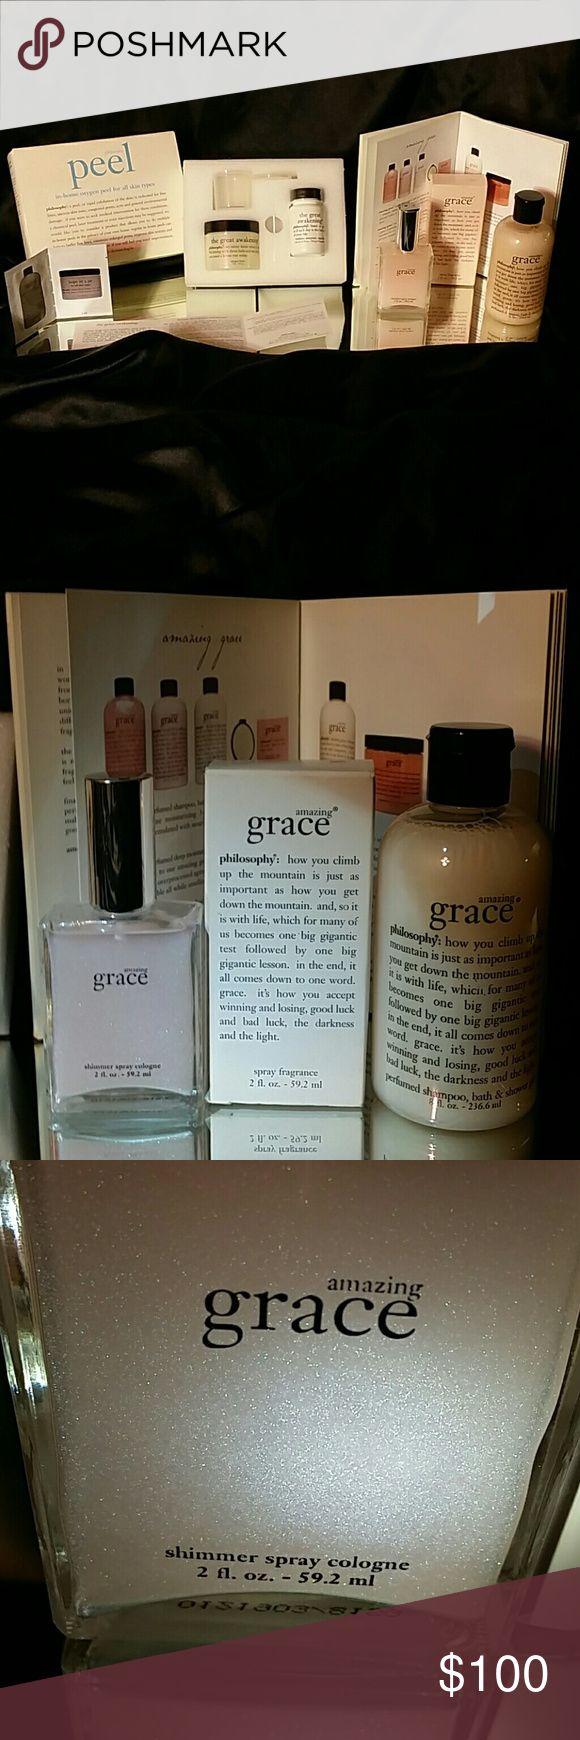 mas de 25 ideas increibles sobre peeling duschgel en pinterest 7 pc philosophy amazing grace set oxygen kit nwt